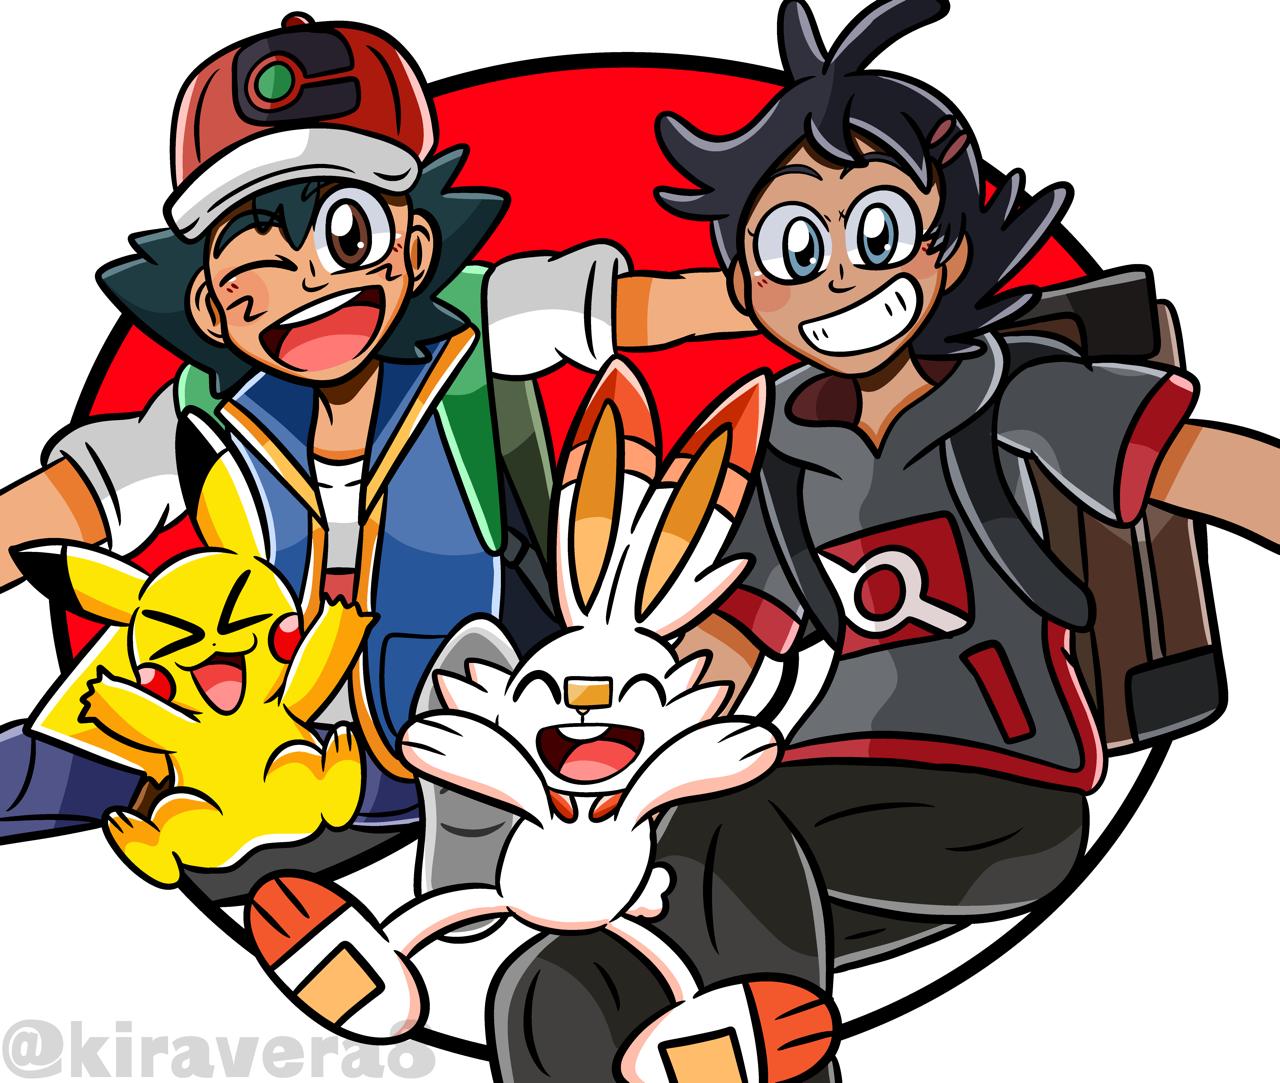 pin by josue pilcol on pokemon pokemon characters pokemon cute pokemon